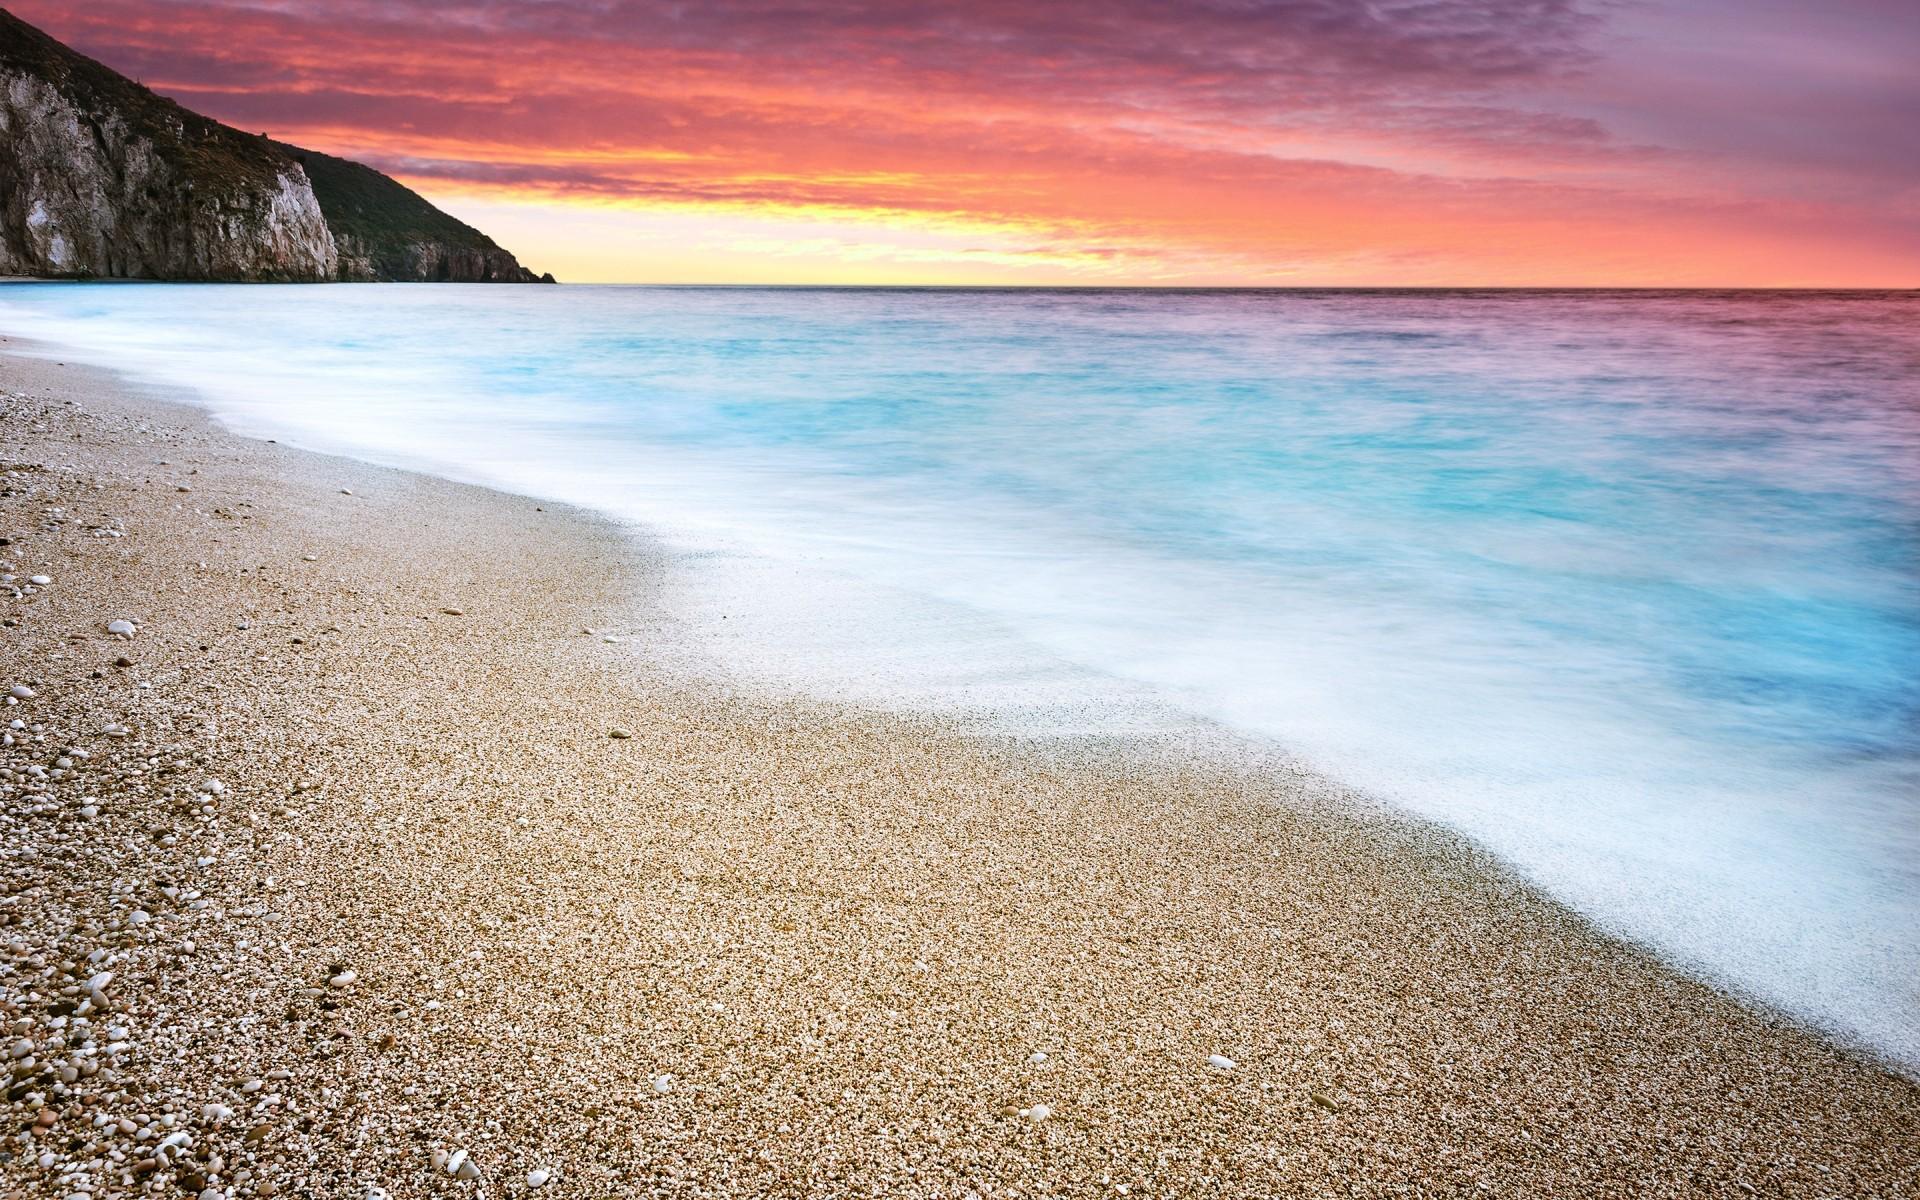 Картинки лето море солнце пляж крым, знакомимся